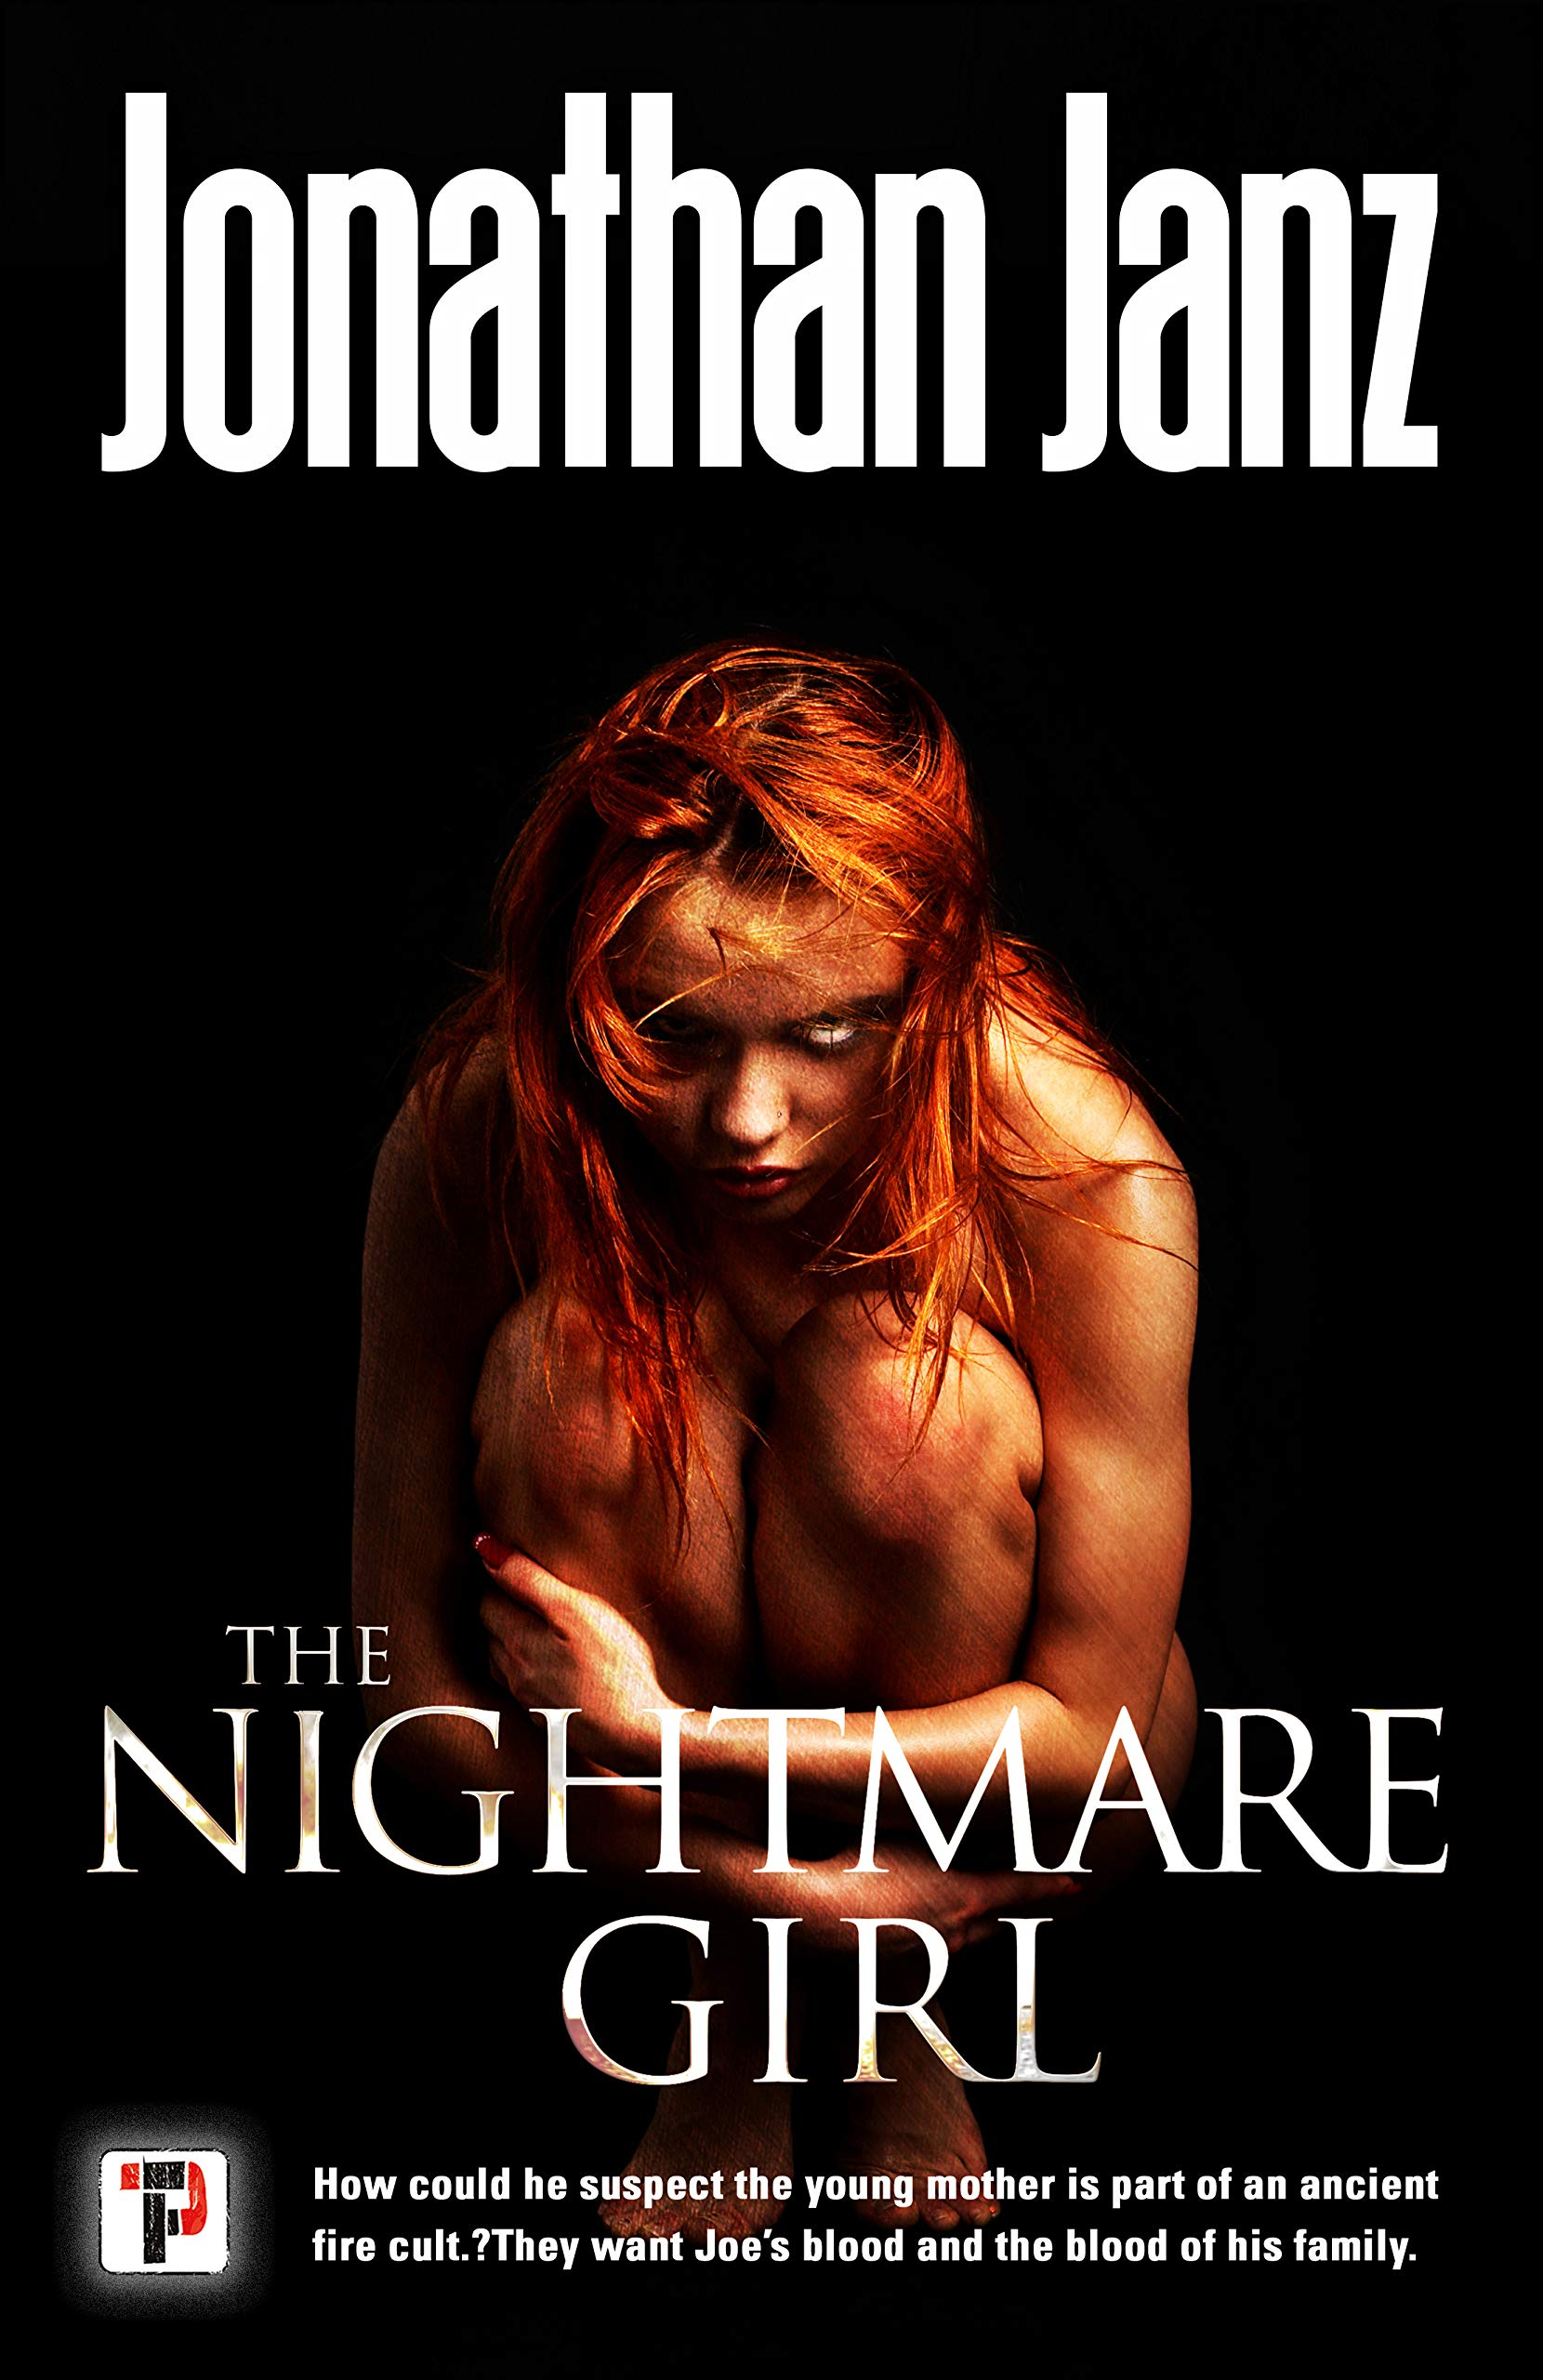 The Nightmare Girl_Jonathan Janz.jpg